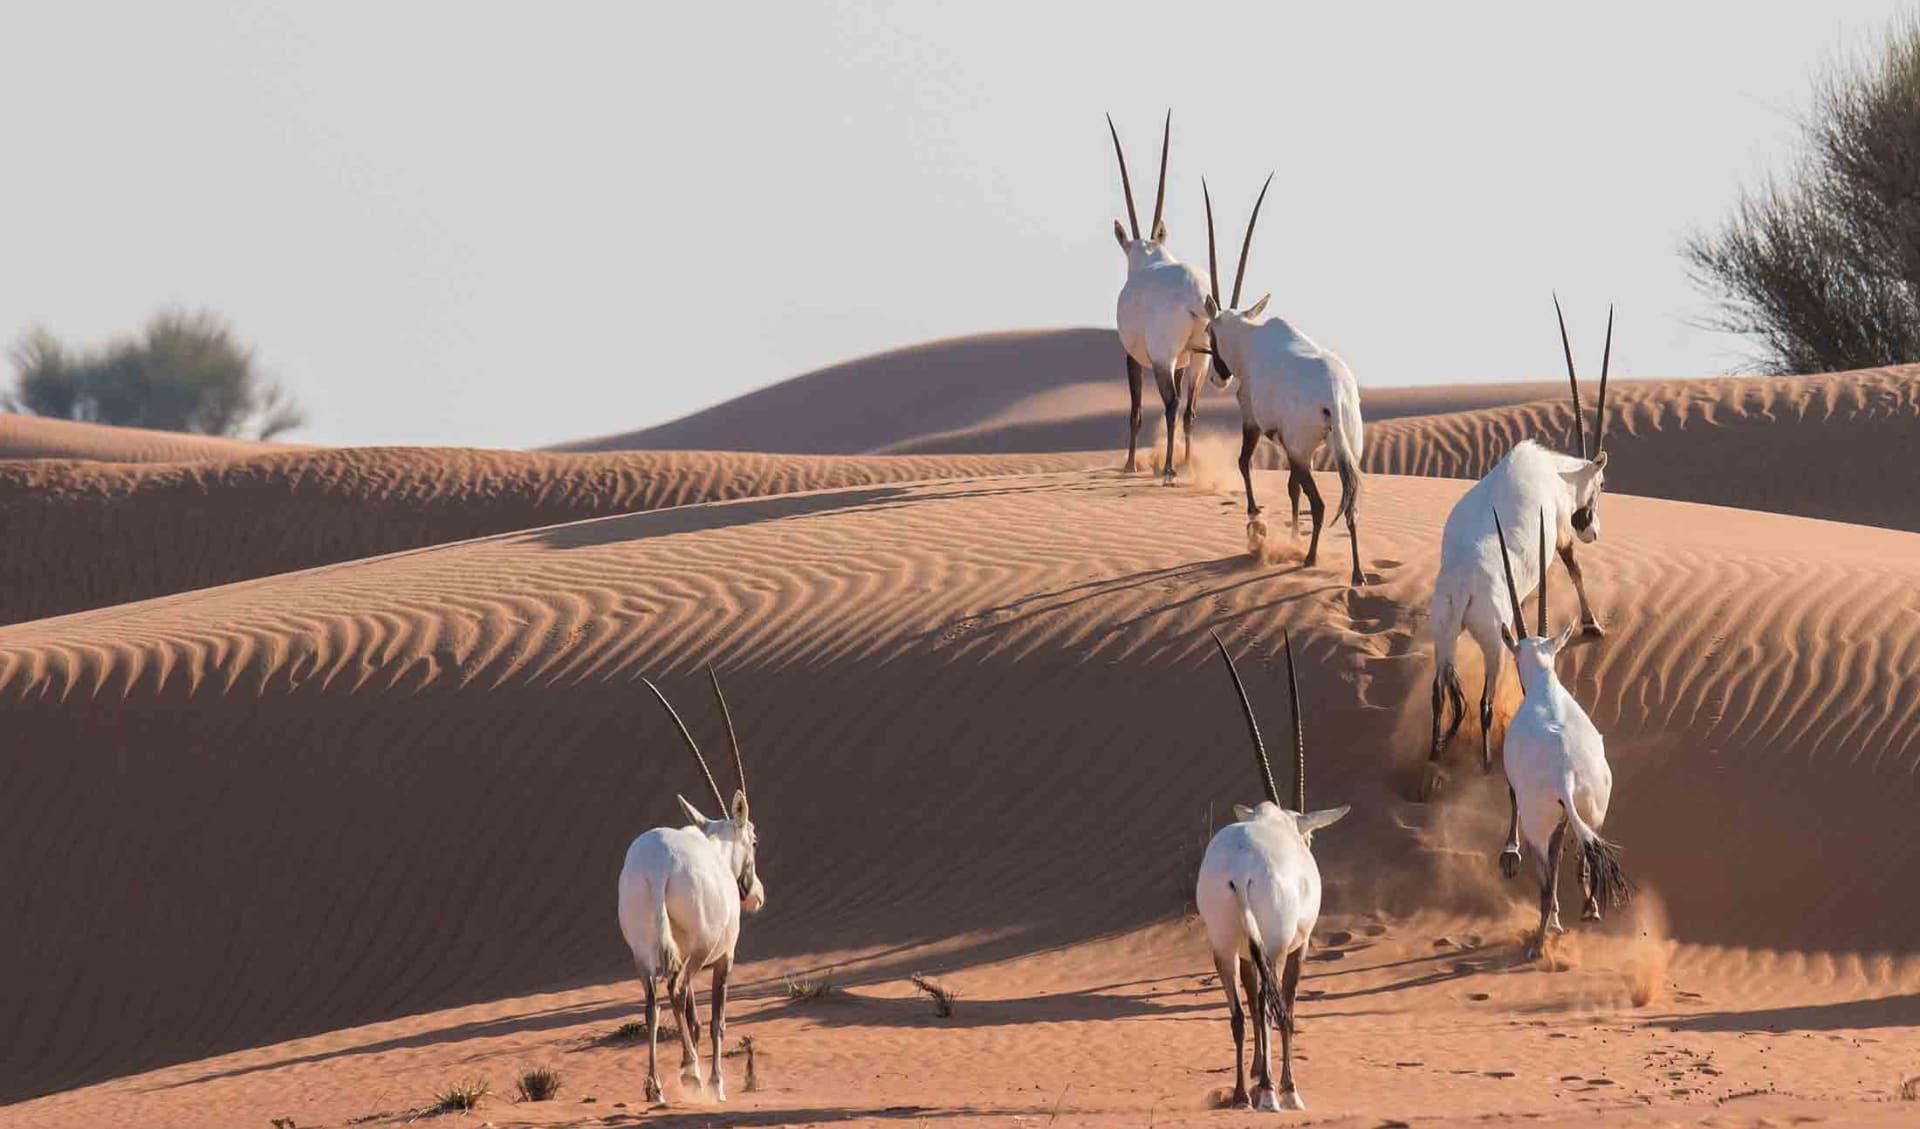 Arabian aryx family, Vereinigte Arabische Emirate